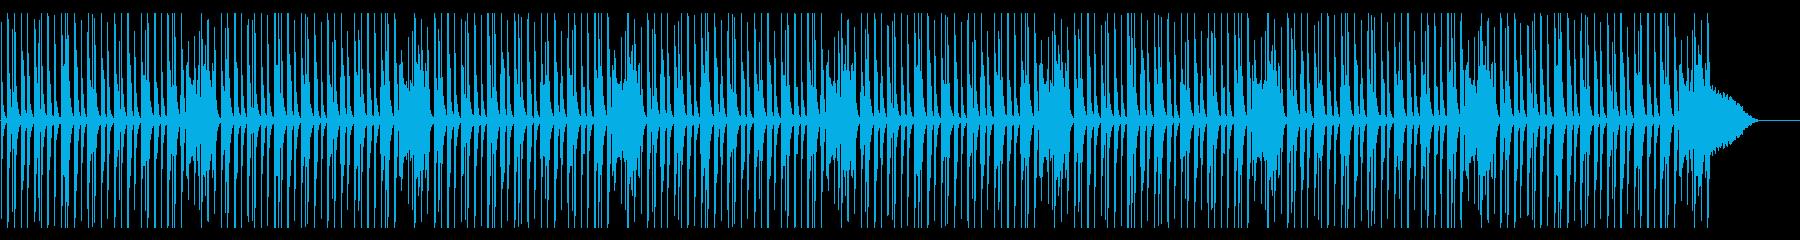 CMやアニメ系の日常(マリンバ)の再生済みの波形